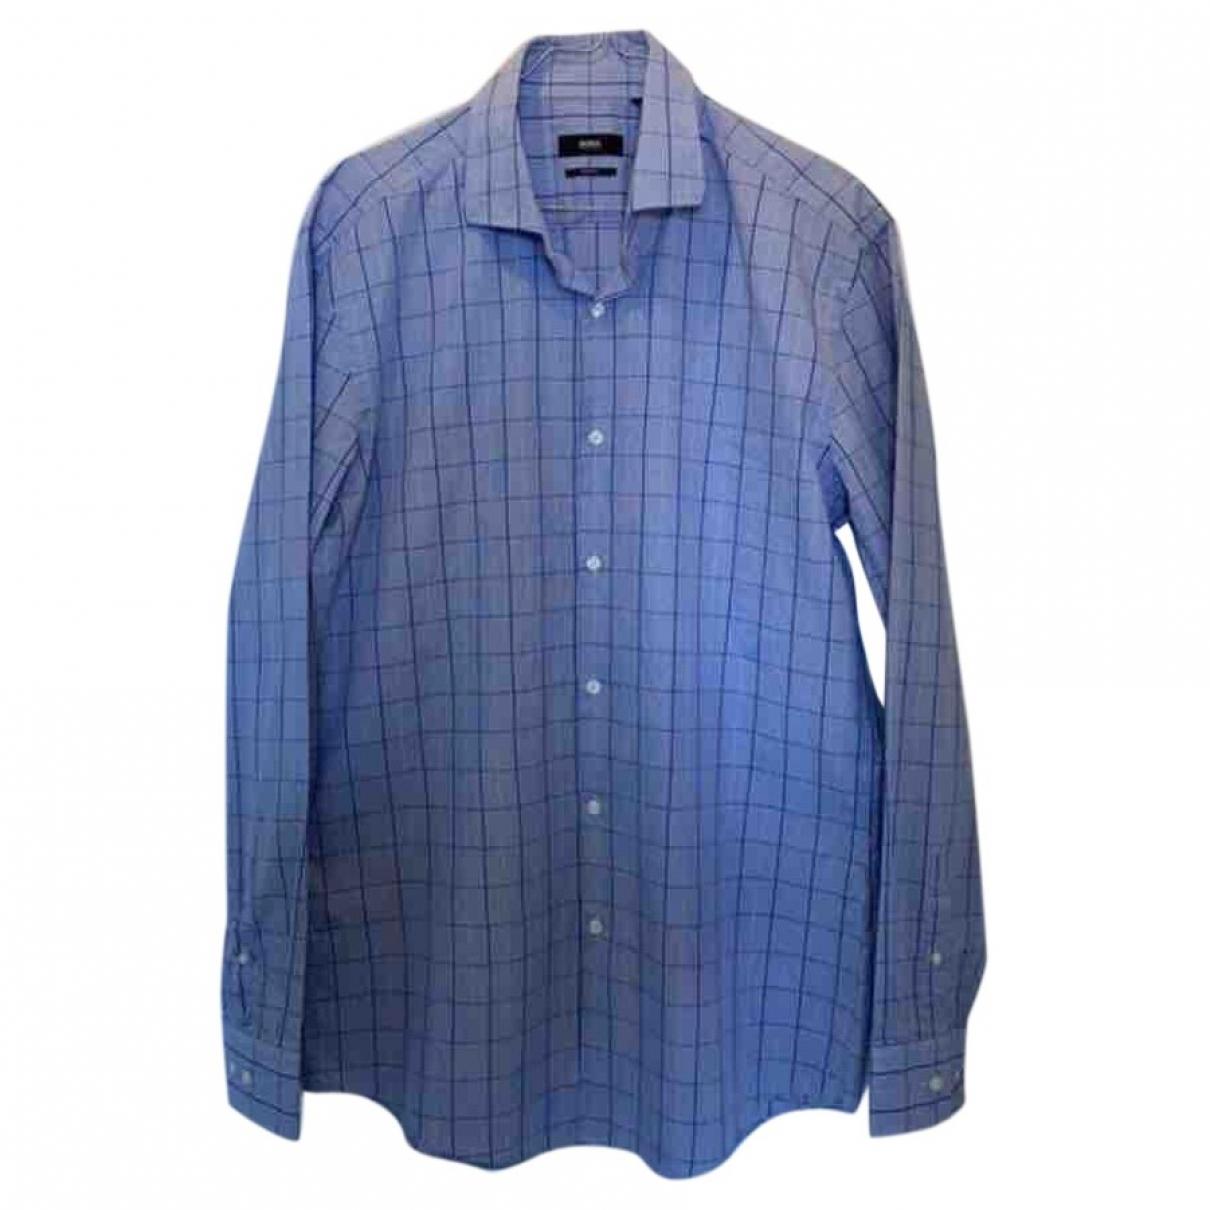 Boss \N Blue Cotton Shirts for Men 42 EU (tour de cou / collar)